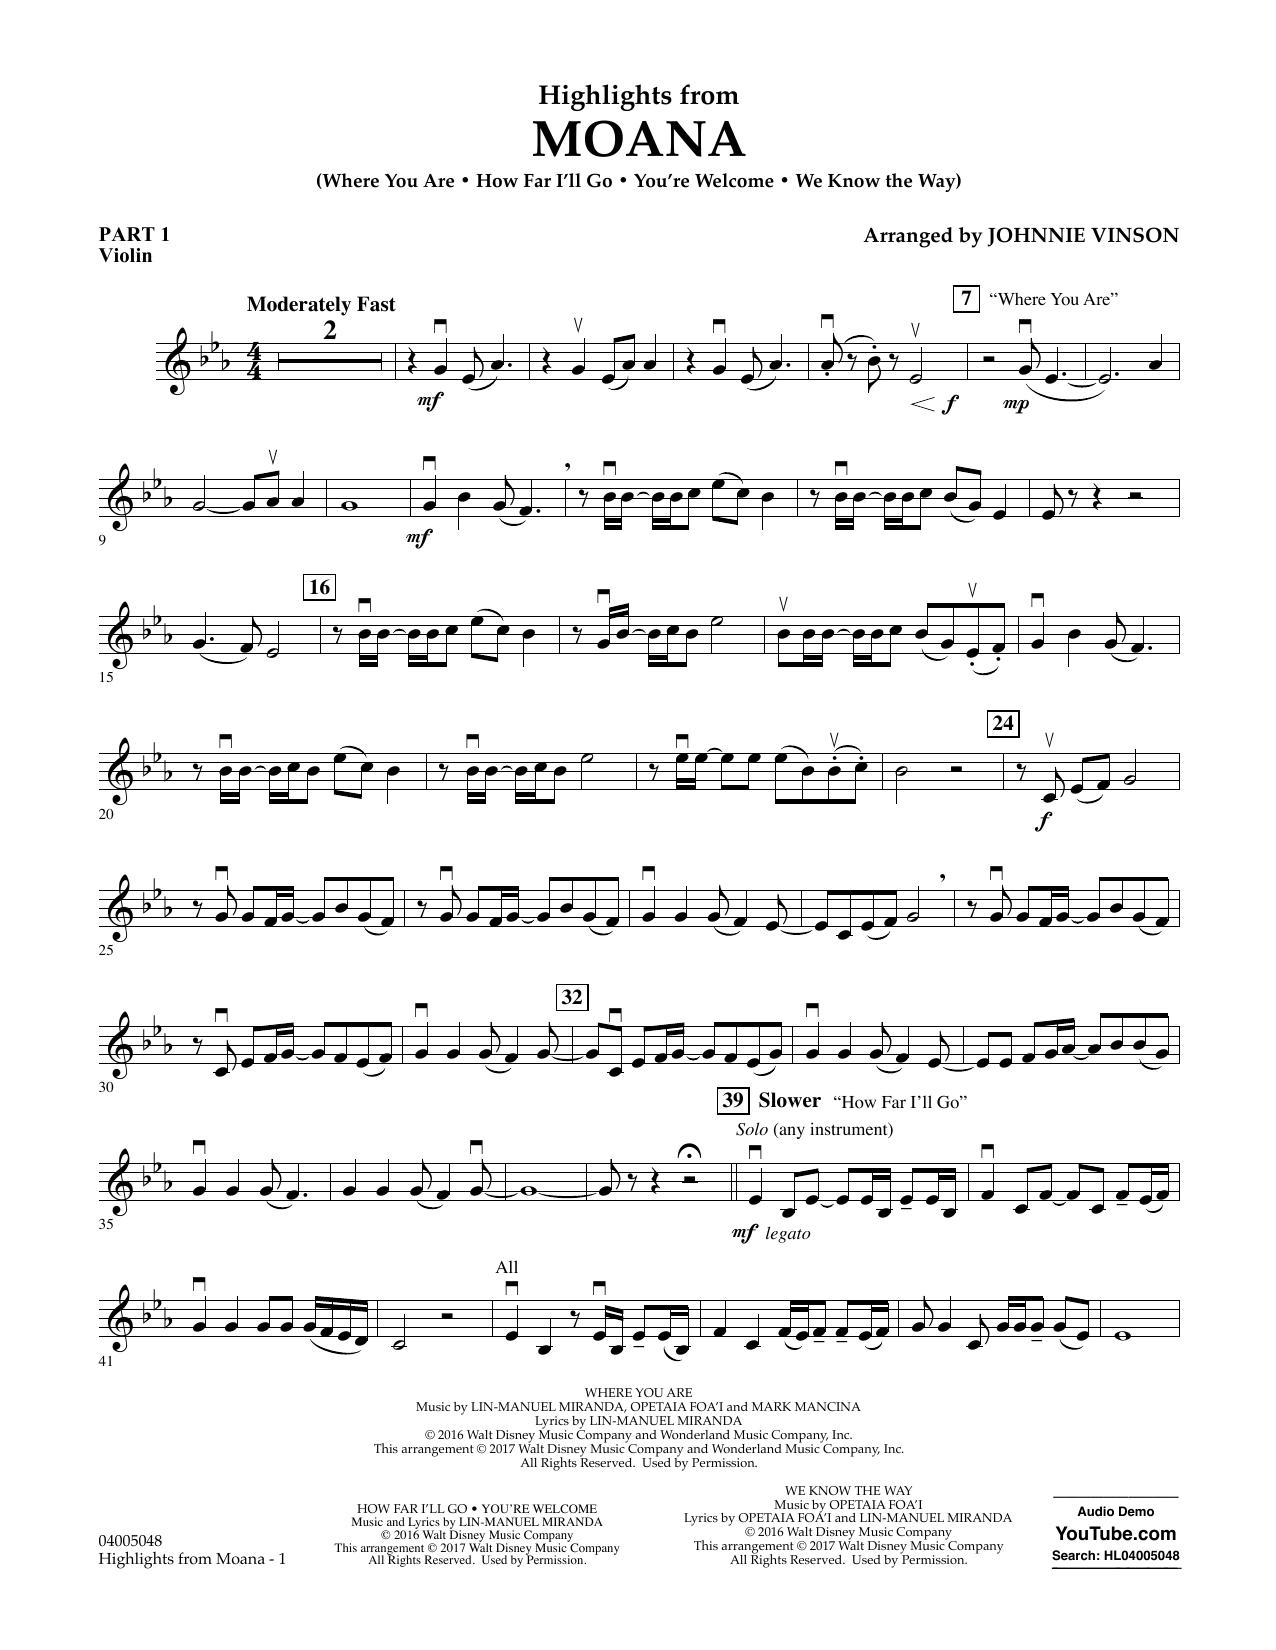 Highlights from Moana - Pt.1 - Violin Sheet Music